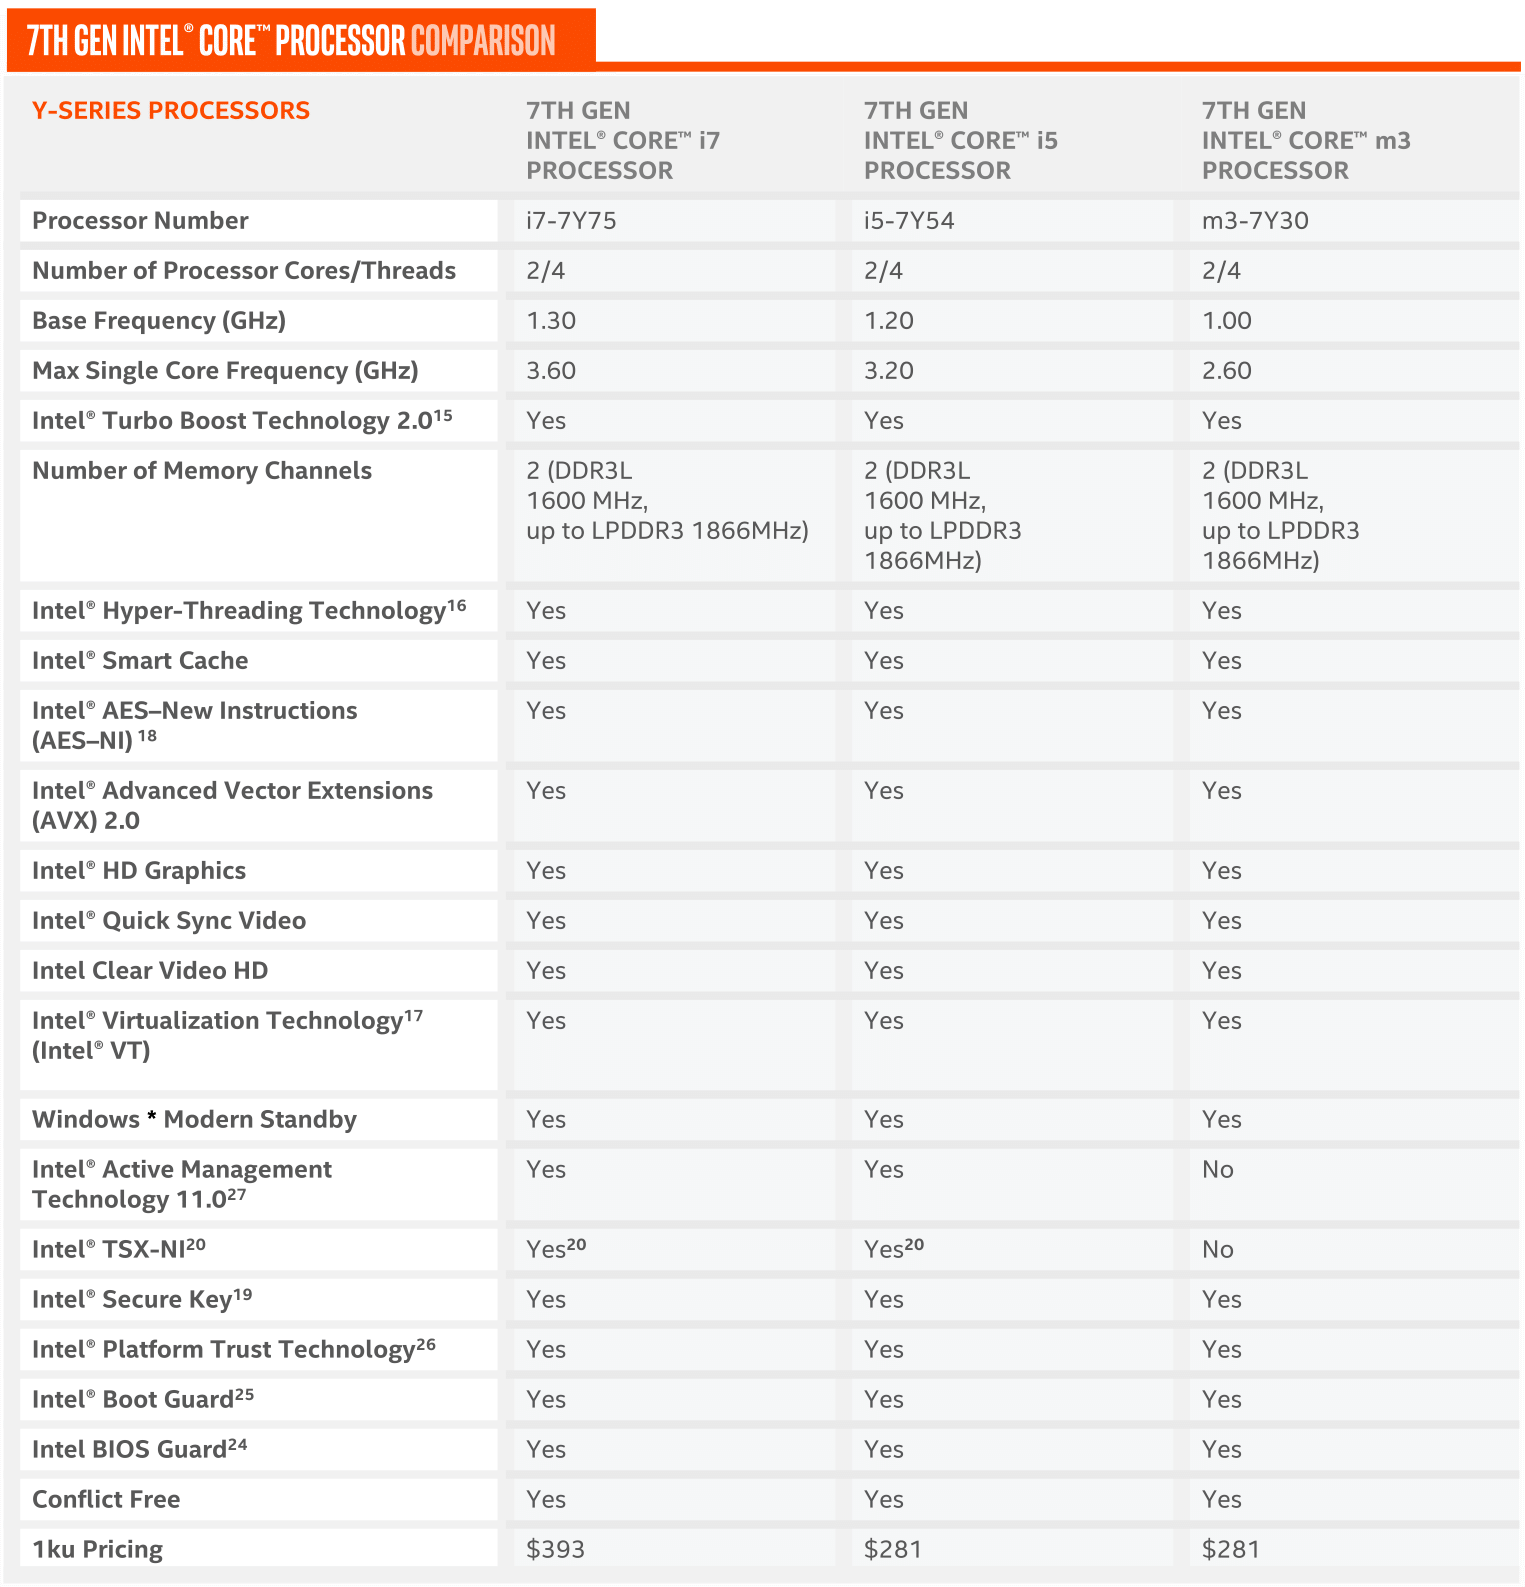 The complete list of Intel Kaby Lake (Kabylake) portable